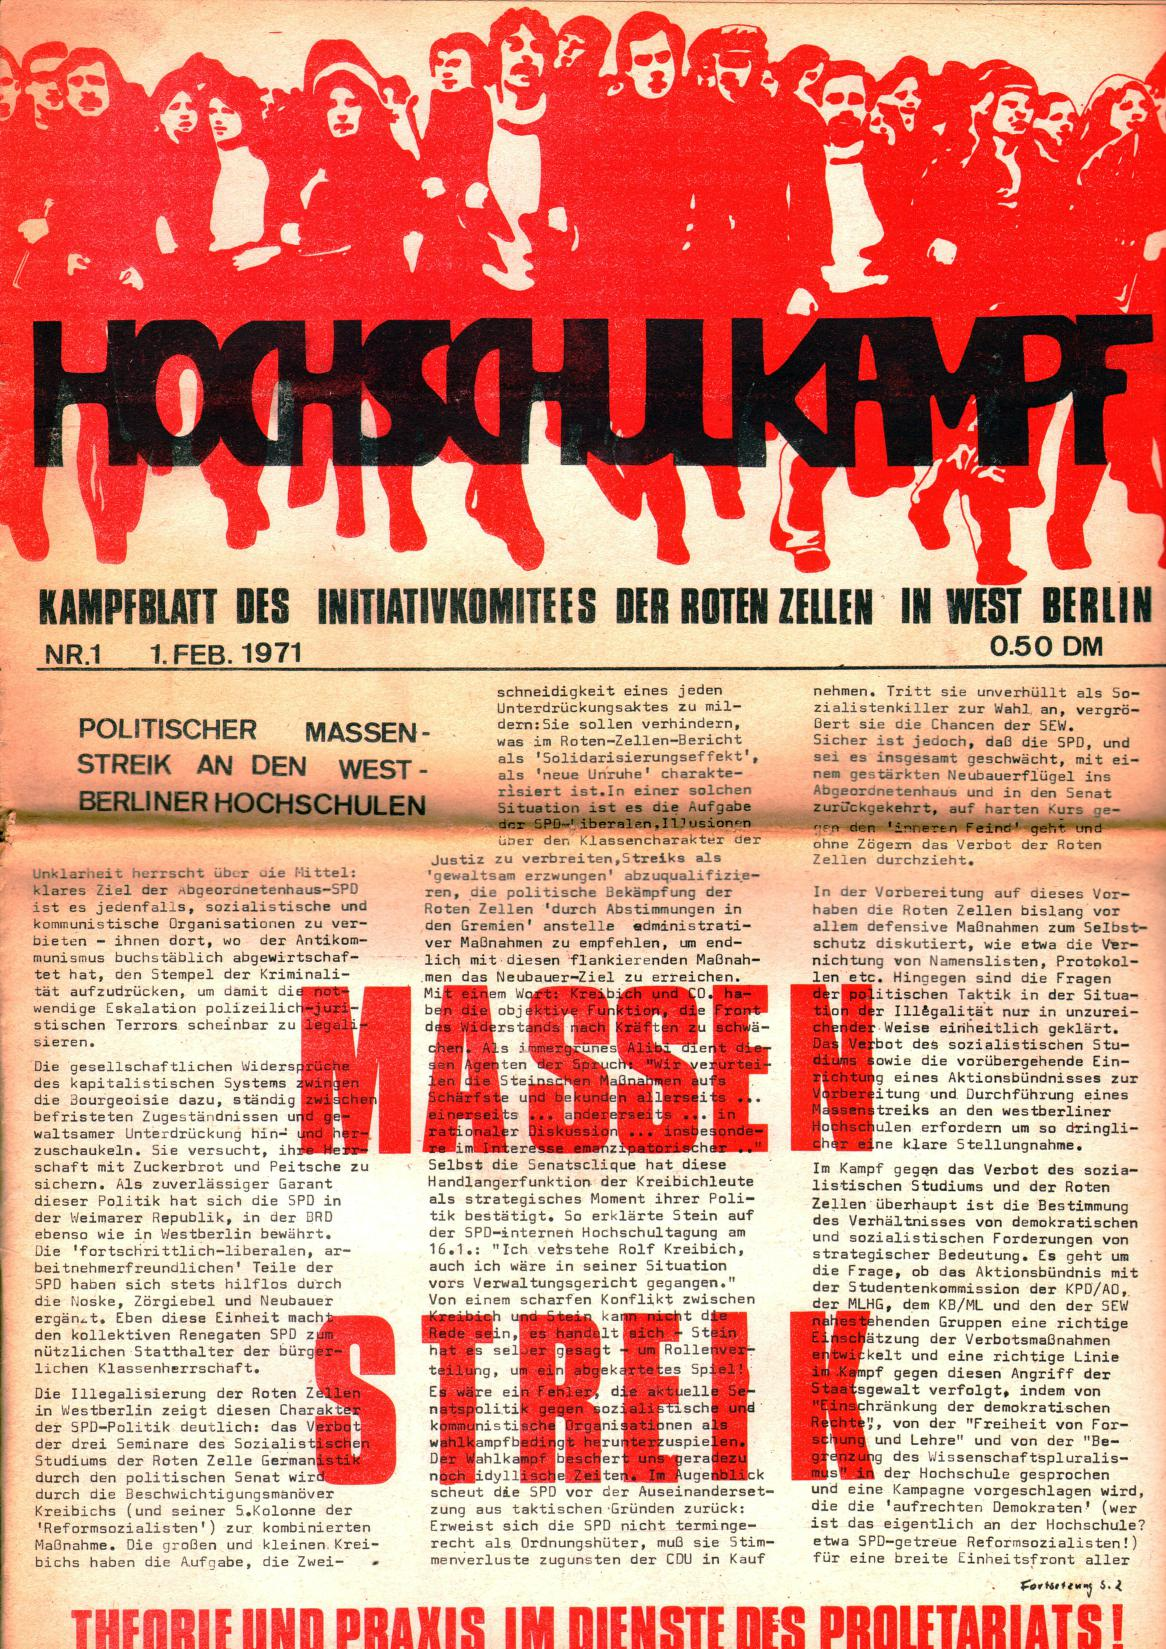 Berlin_Hochschulkampf_1971_01_01